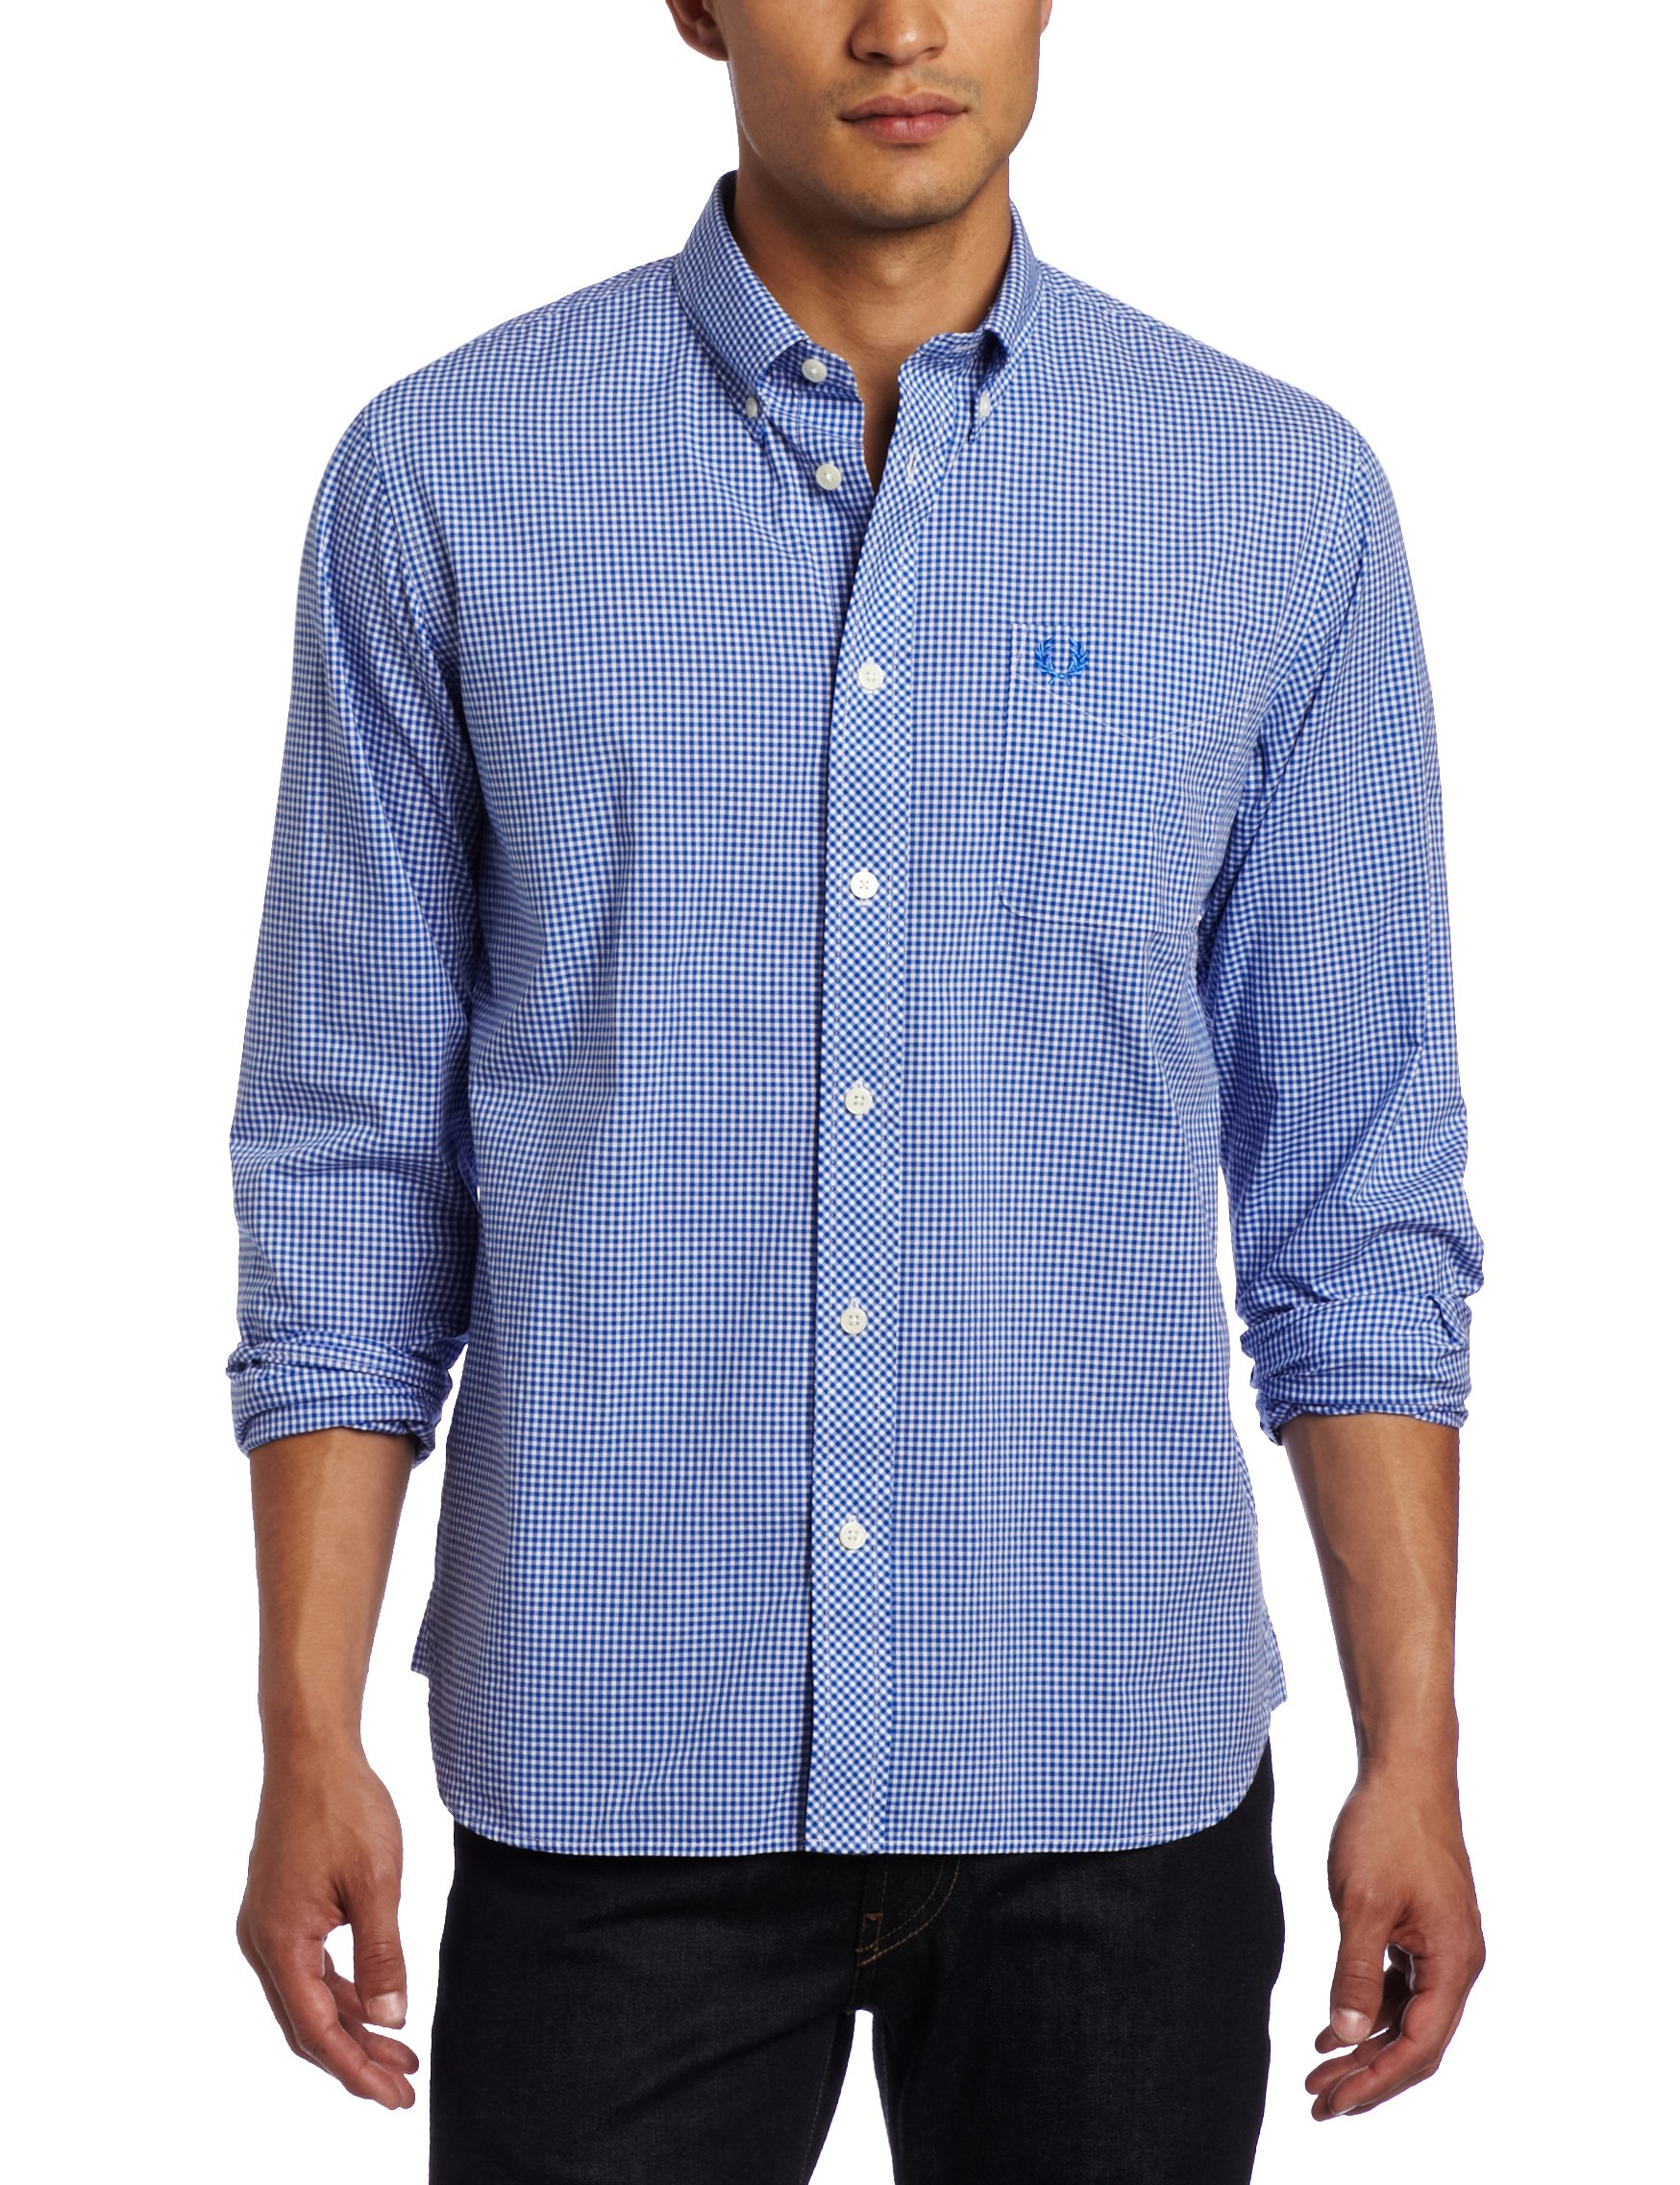 Fred Perry Men's Gingham Shirt, Olympian Blue, Medium